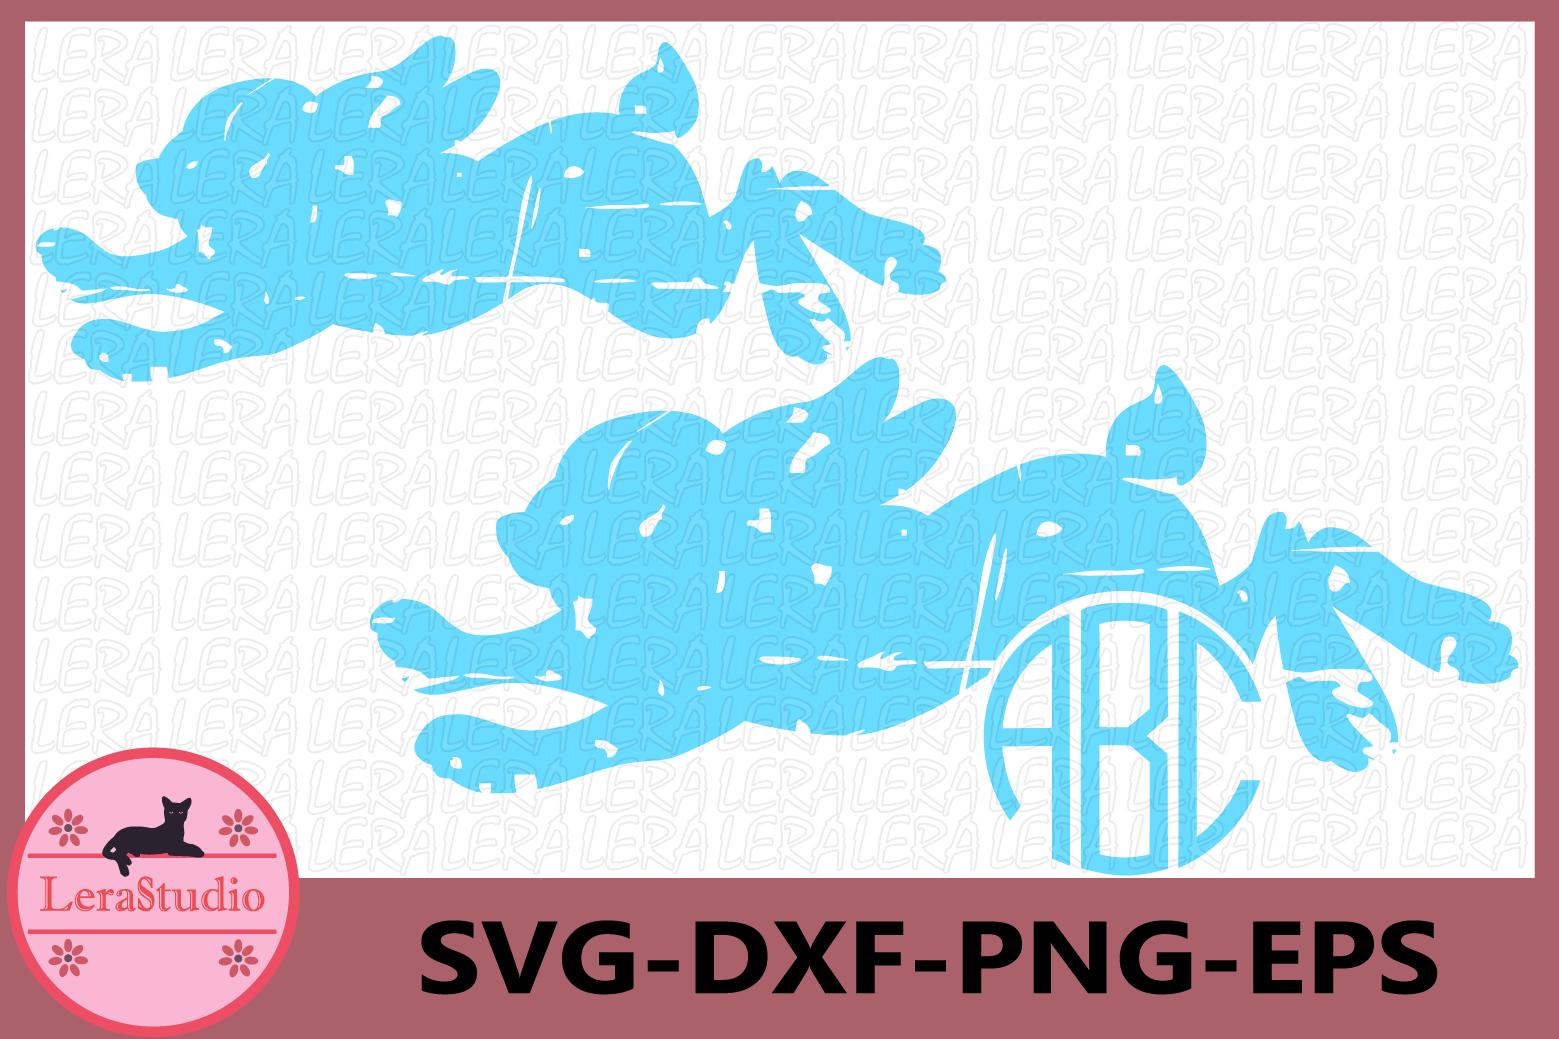 Bunnies SVG, Grunge SVG, Rabbits Grunge svg, Rabbits example image 1